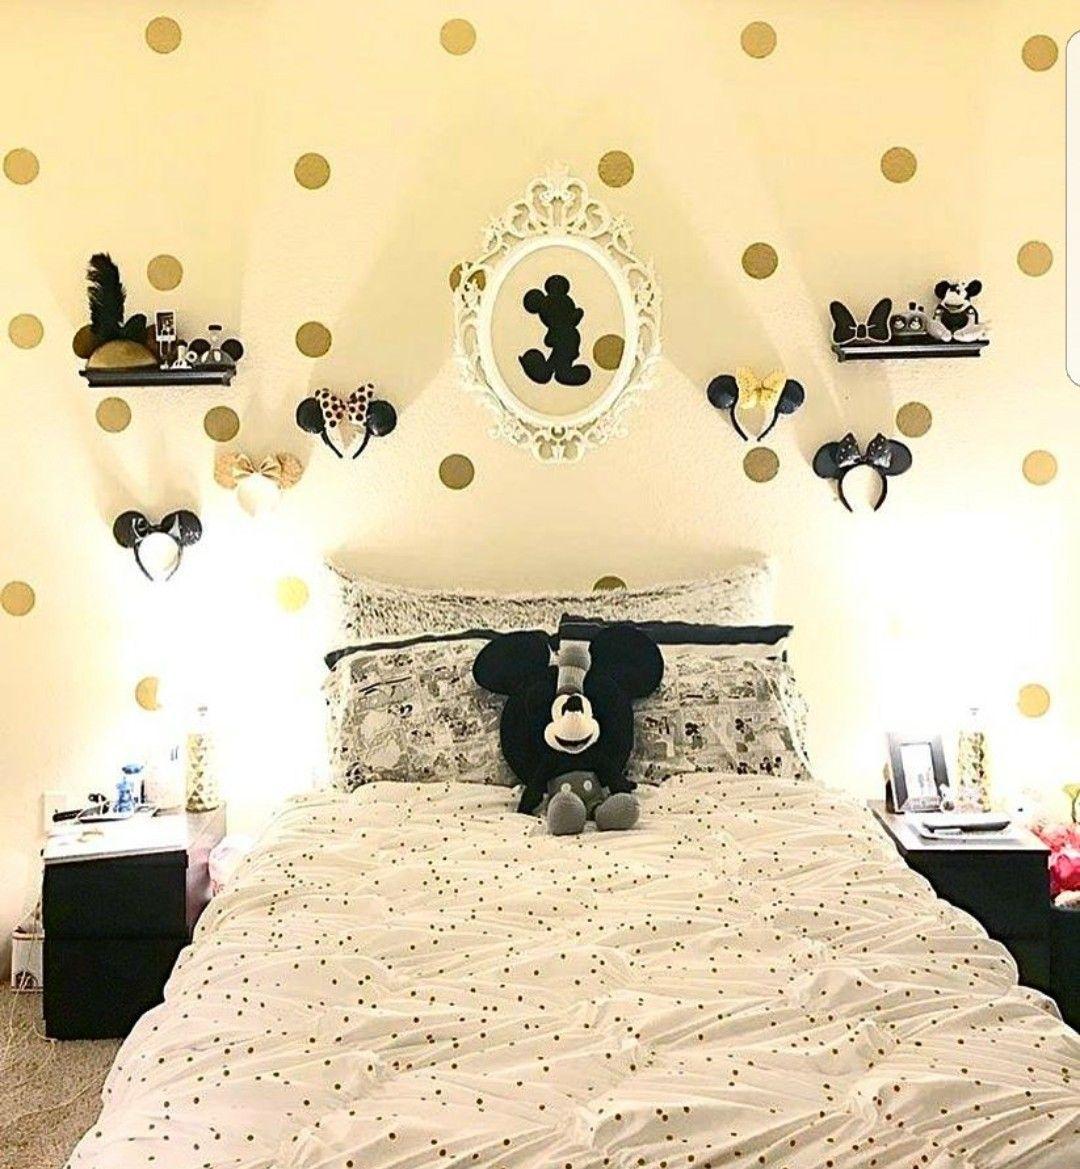 Disney home decor idea | Disney | Pinterest | Disney rooms, Bedrooms ...